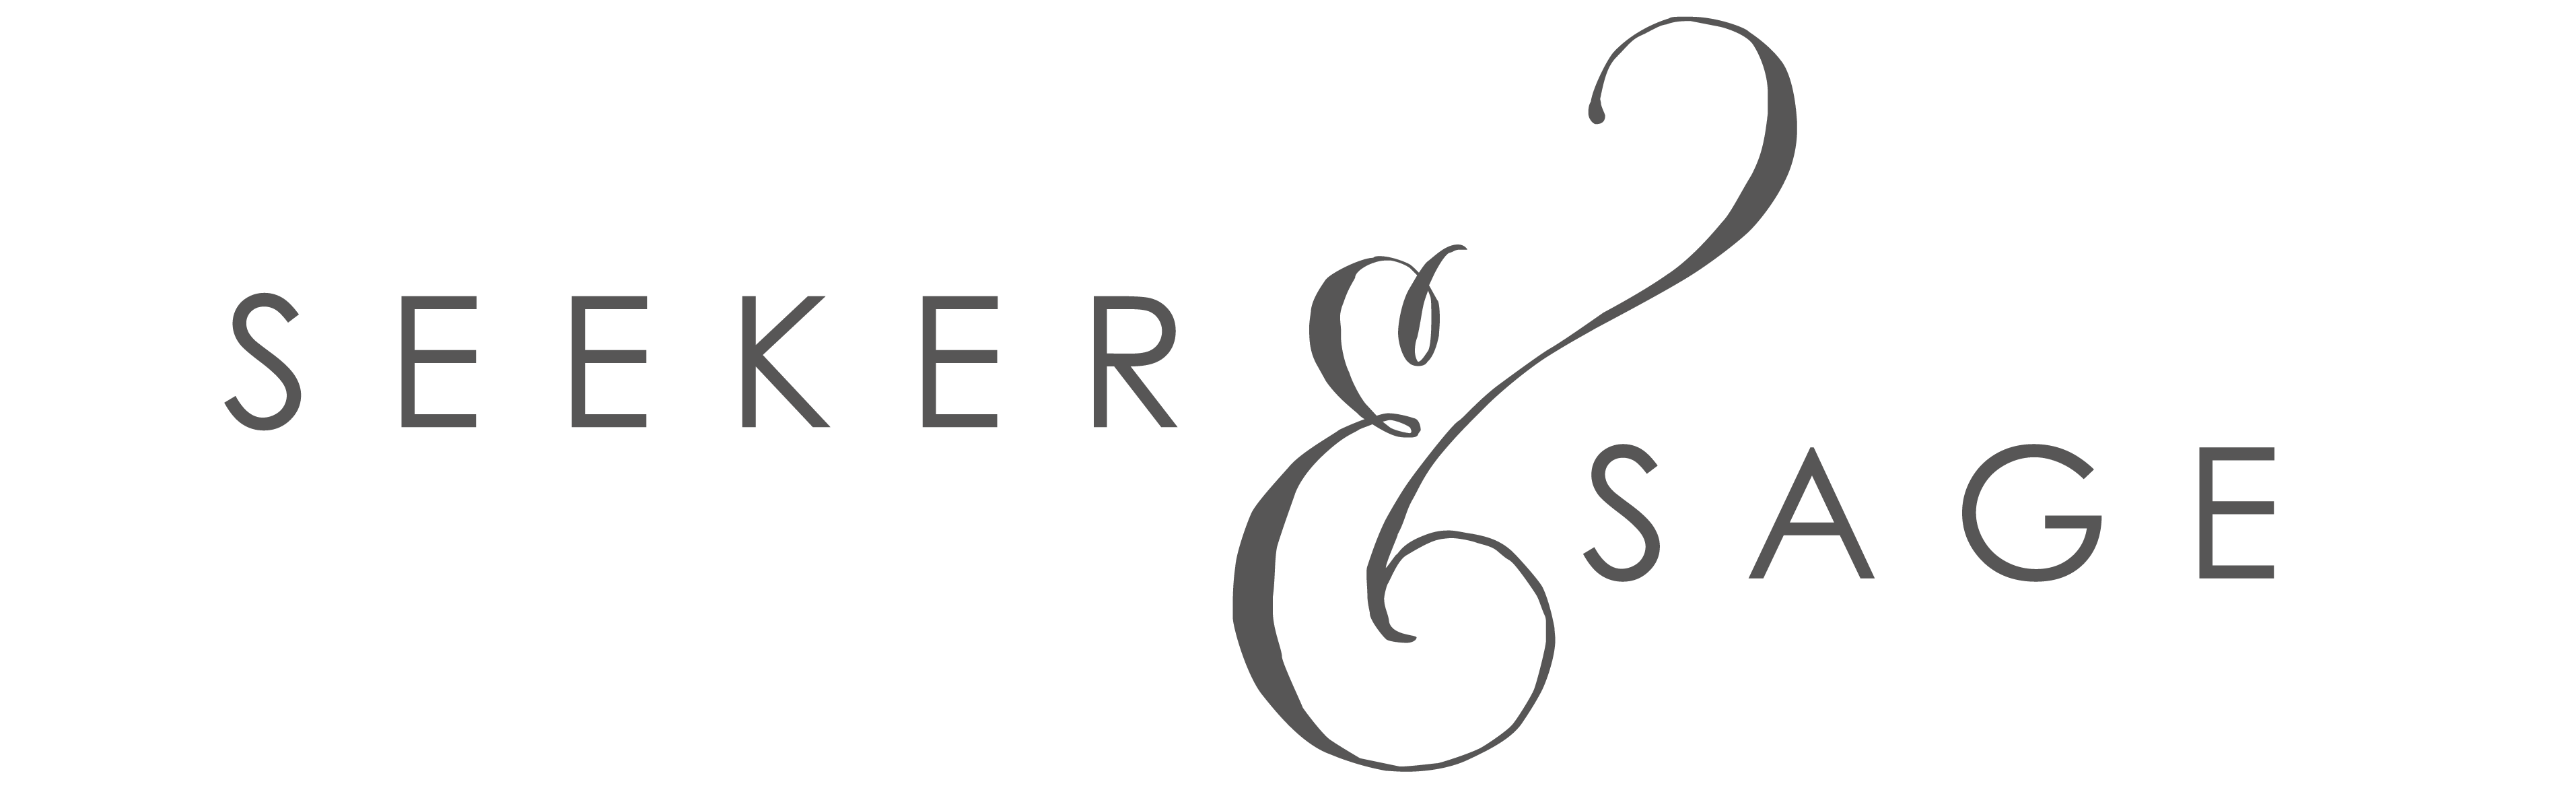 Seeker & Sage